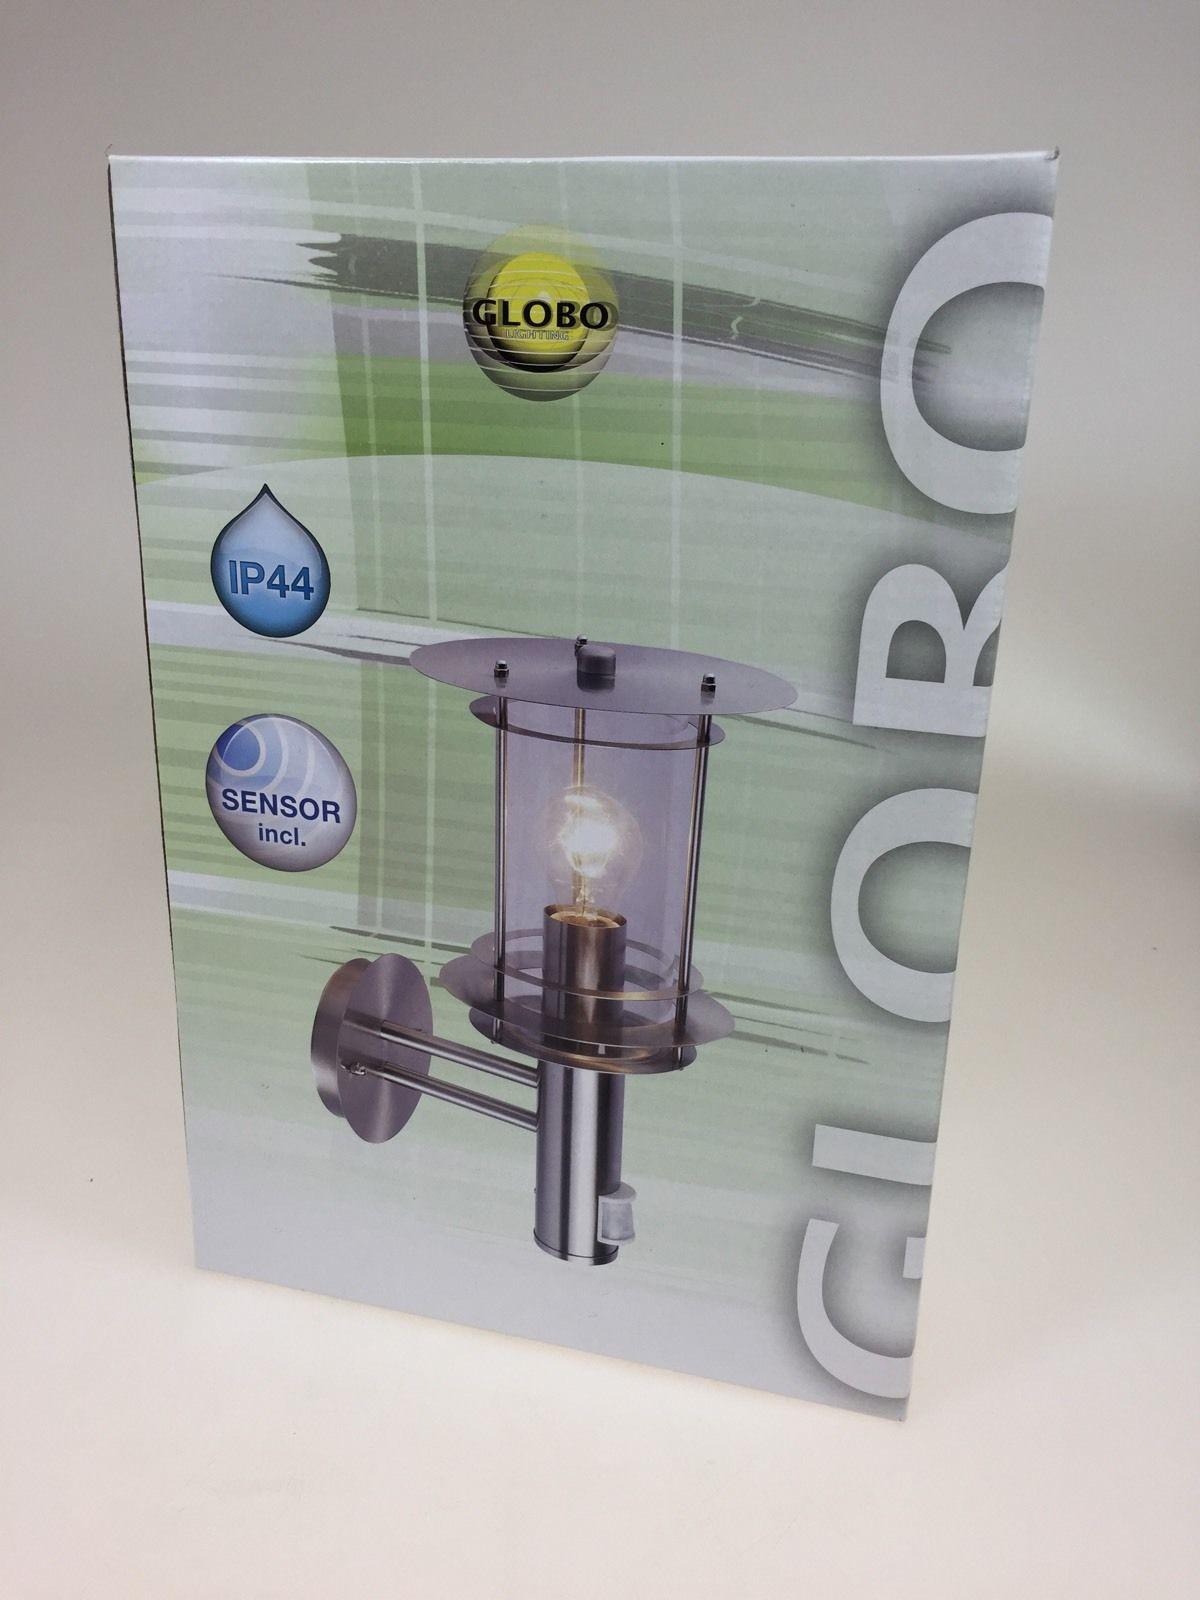 aussenleuchte mit bewegungsmelder leuchte lampe edelstahl globo. Black Bedroom Furniture Sets. Home Design Ideas